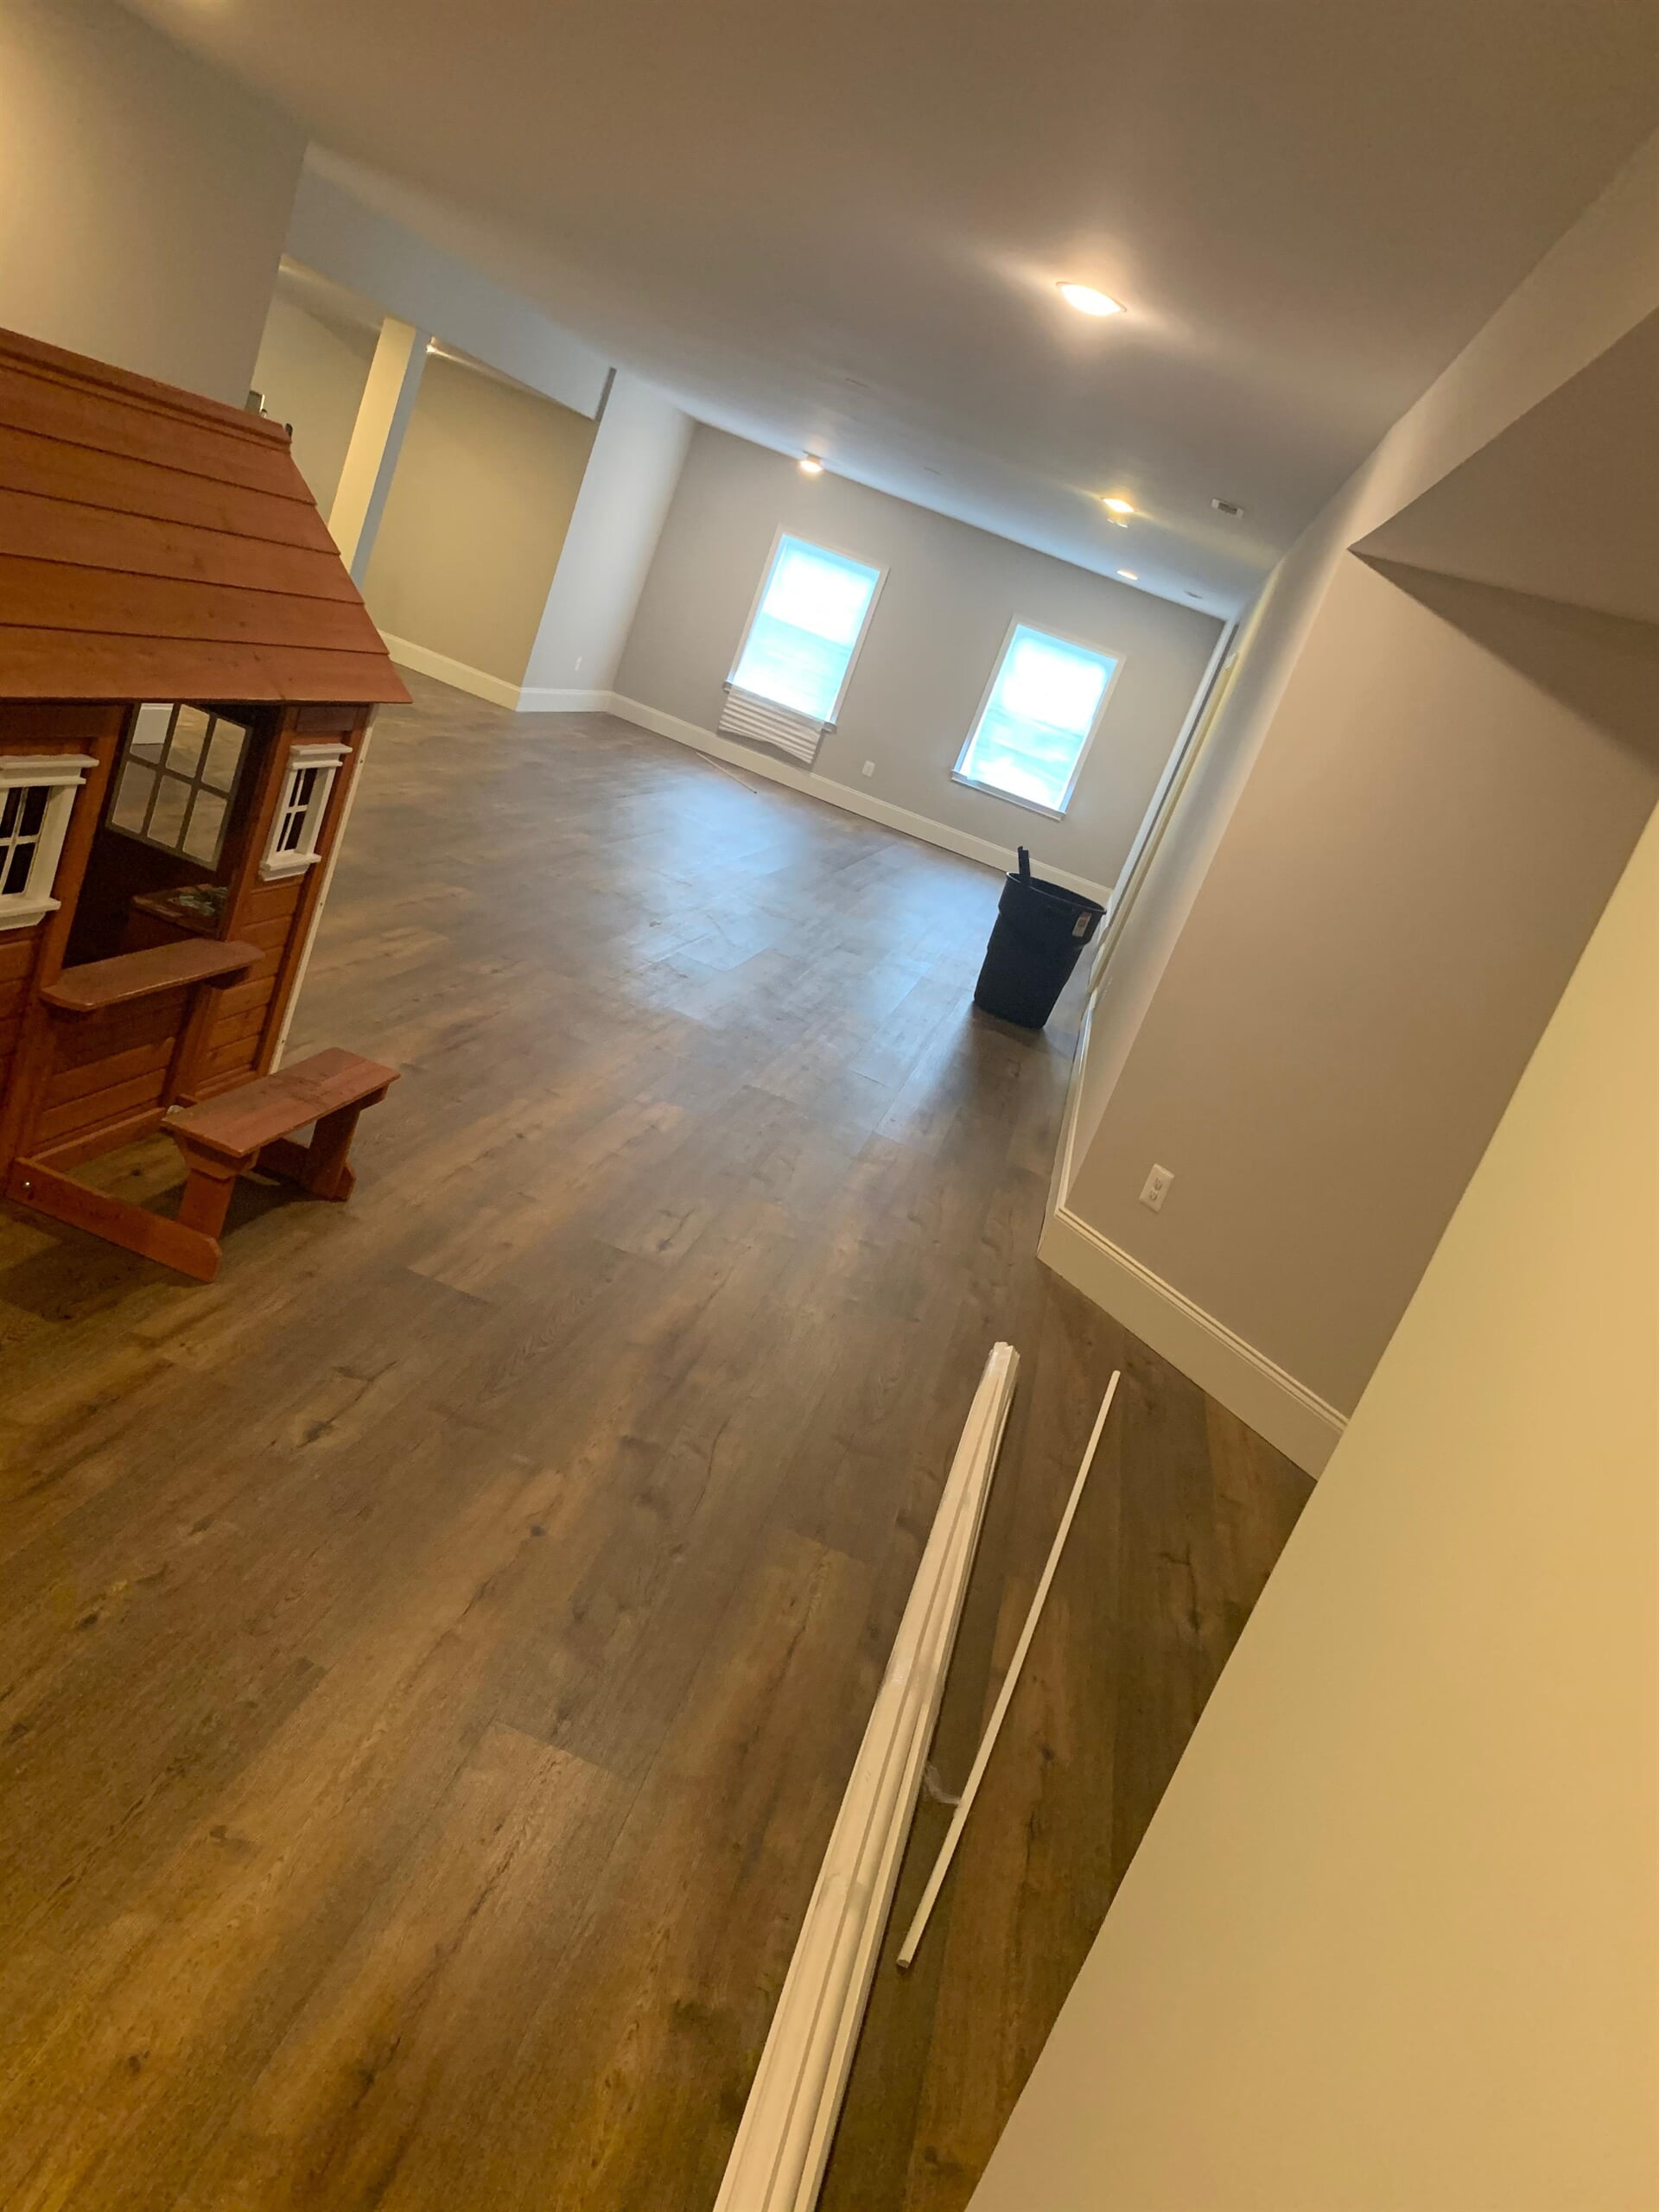 Modern hardsurface flooring installation in a Potomac, MD home